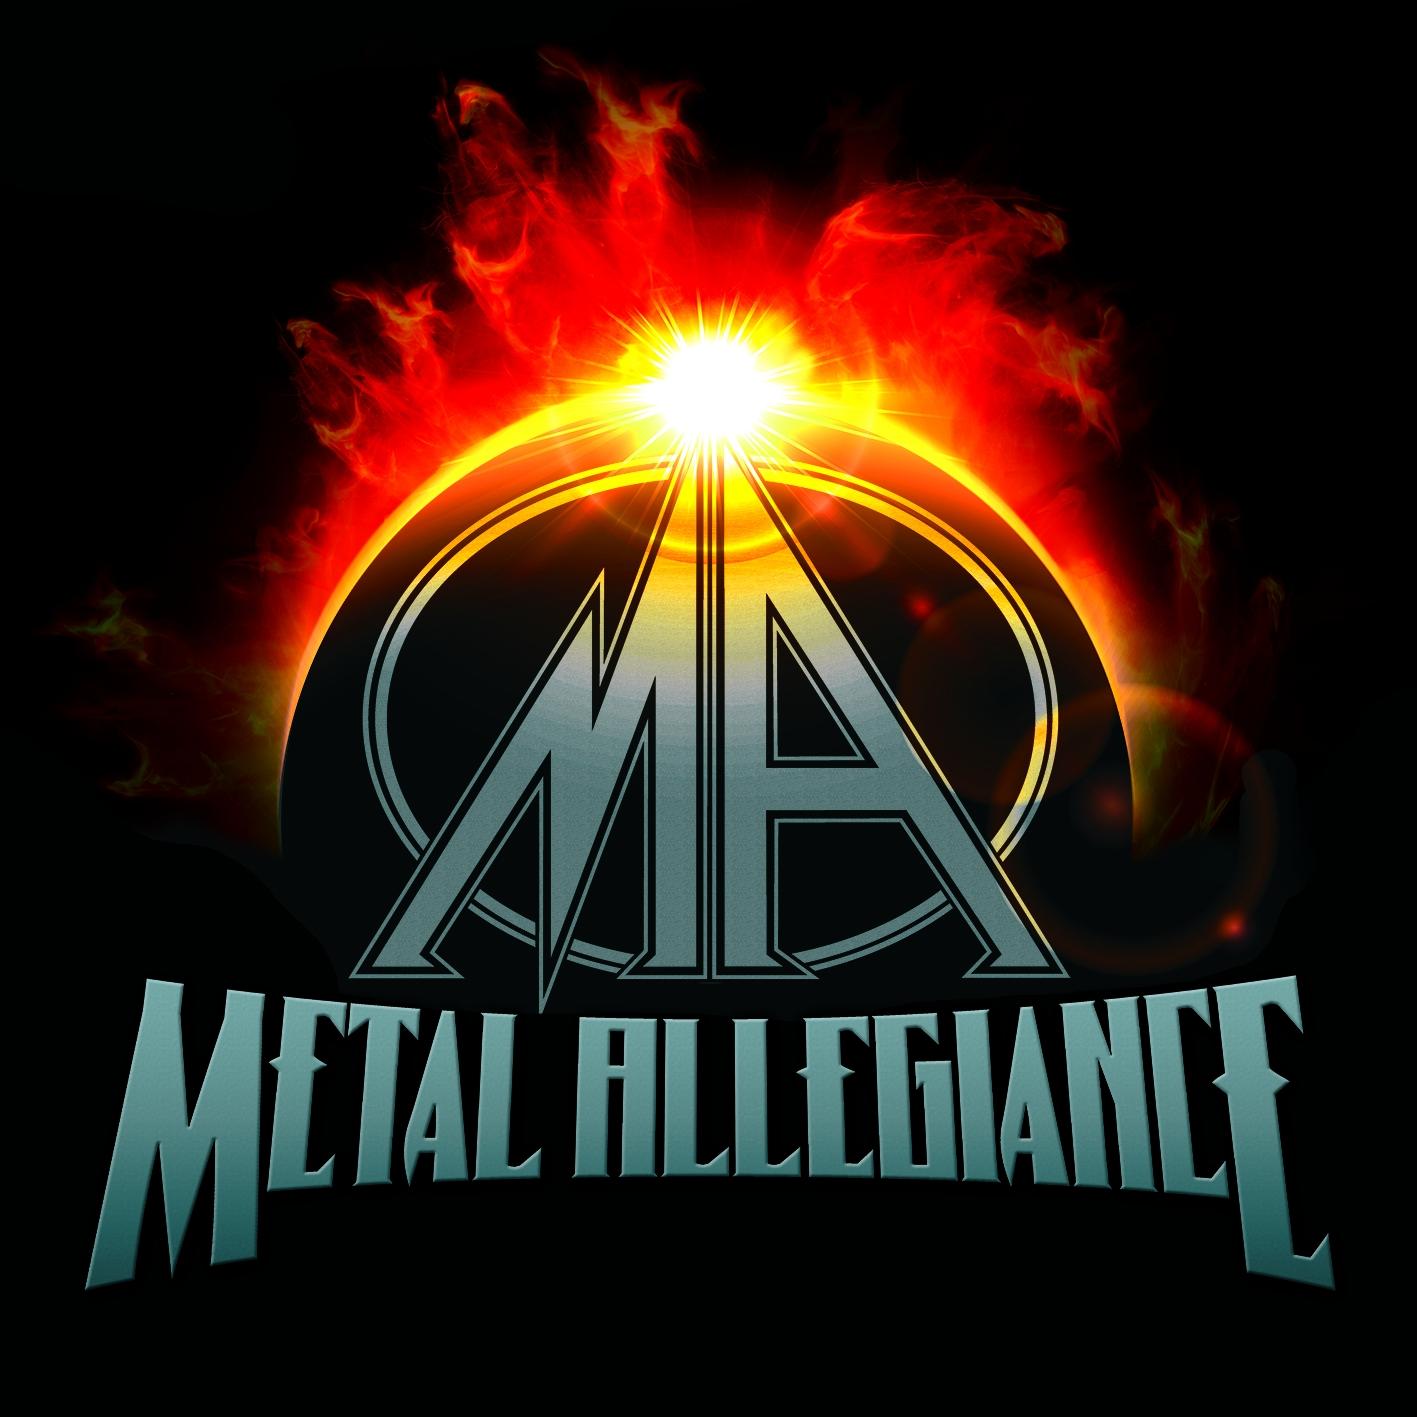 metal_allegiance_metal_allegiance_artwork.jpg